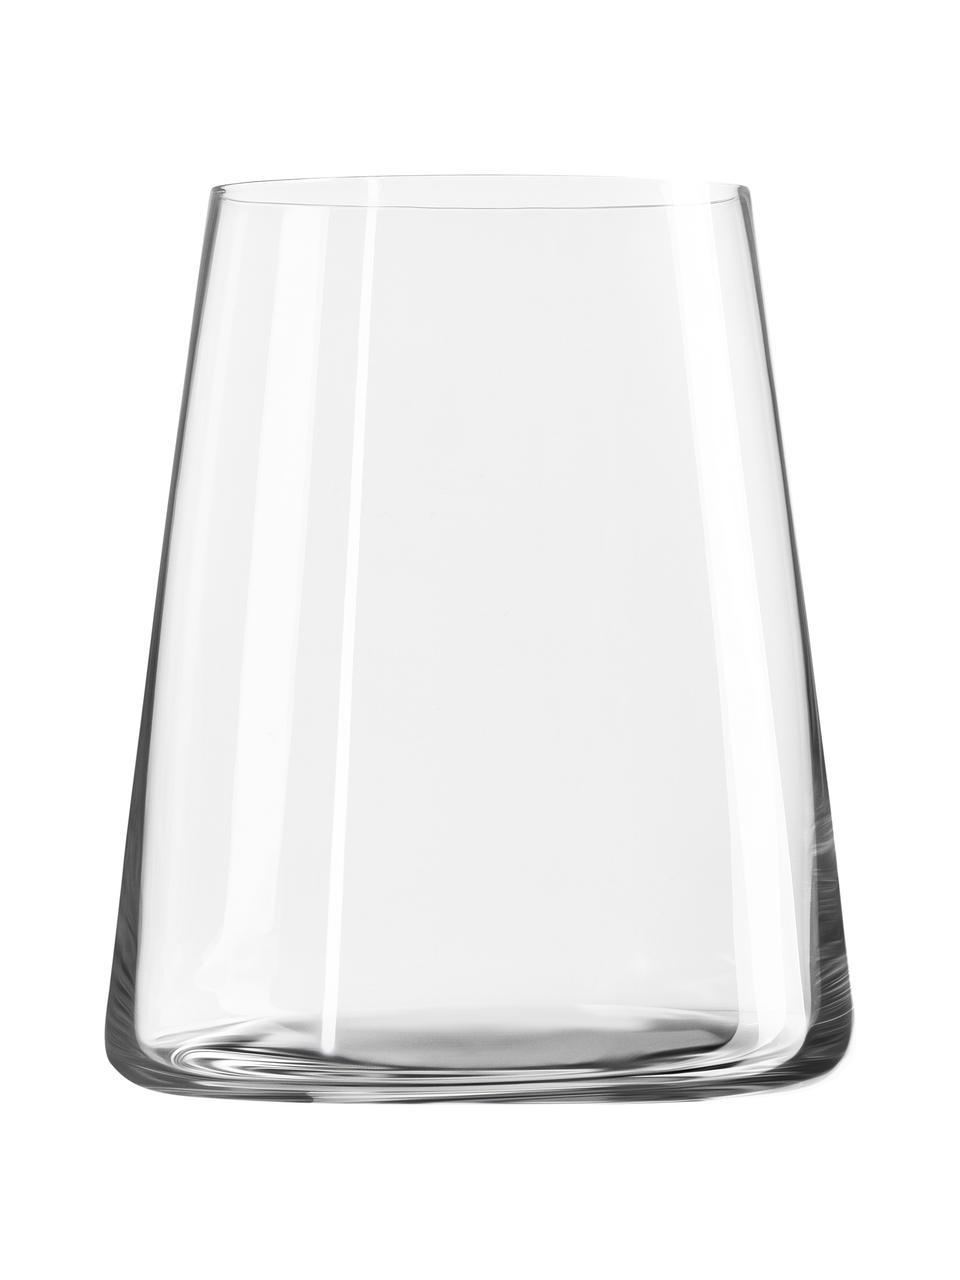 Szklanka ze szkła kryształowego Power, 6 szt., Szkło kryształowe, Transparentny, Ø 9 x W 10 cm